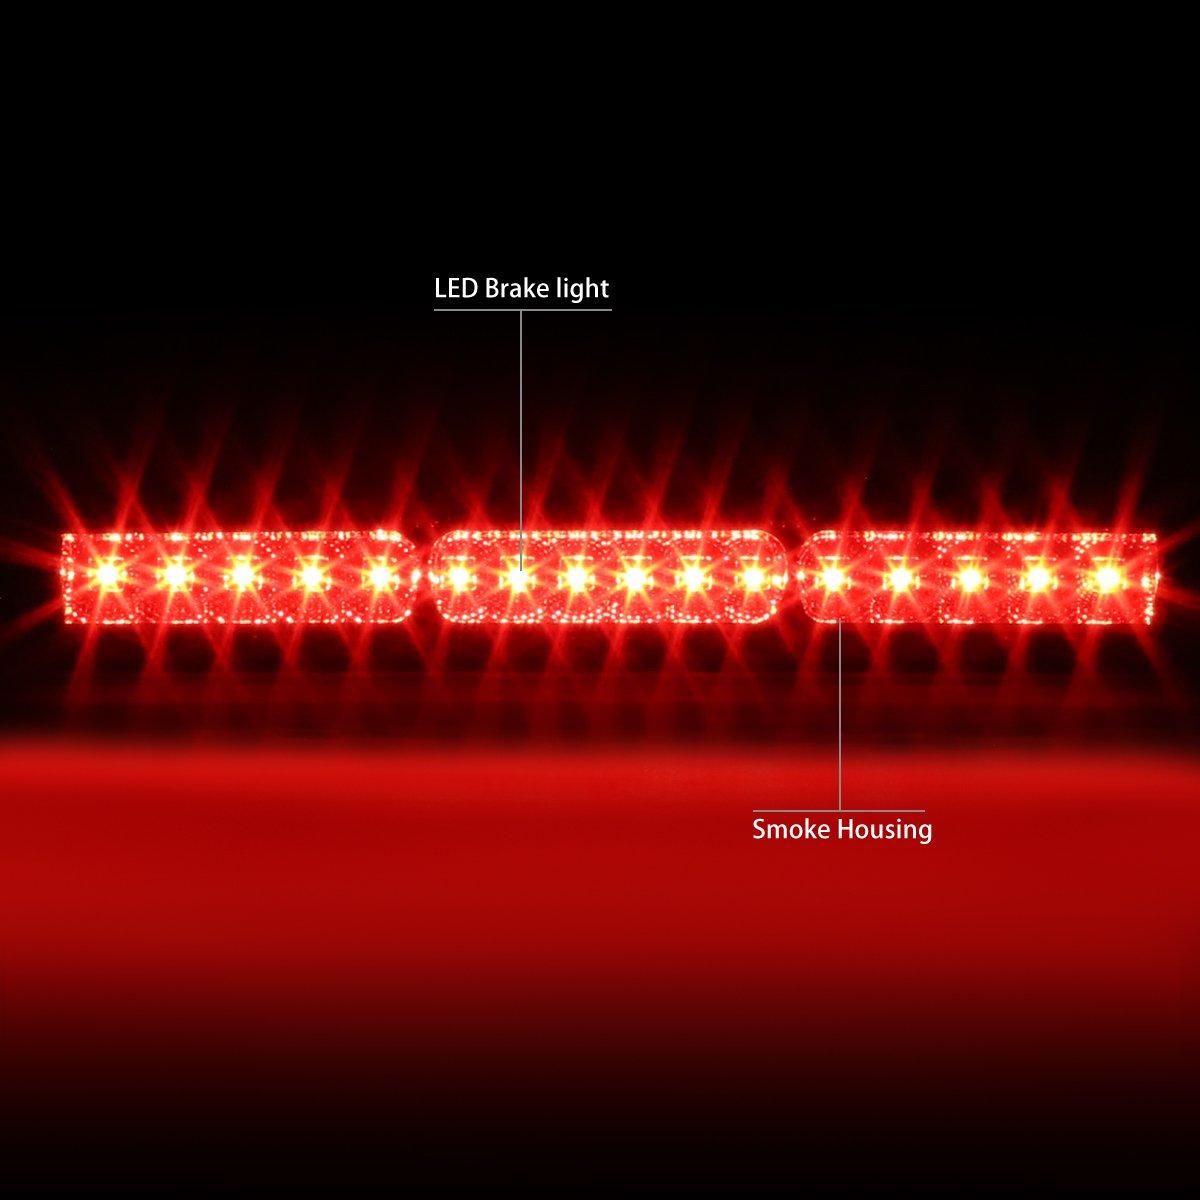 DNA MOTORING 3BL-F15097-LED-T2-SM Third Brake Light